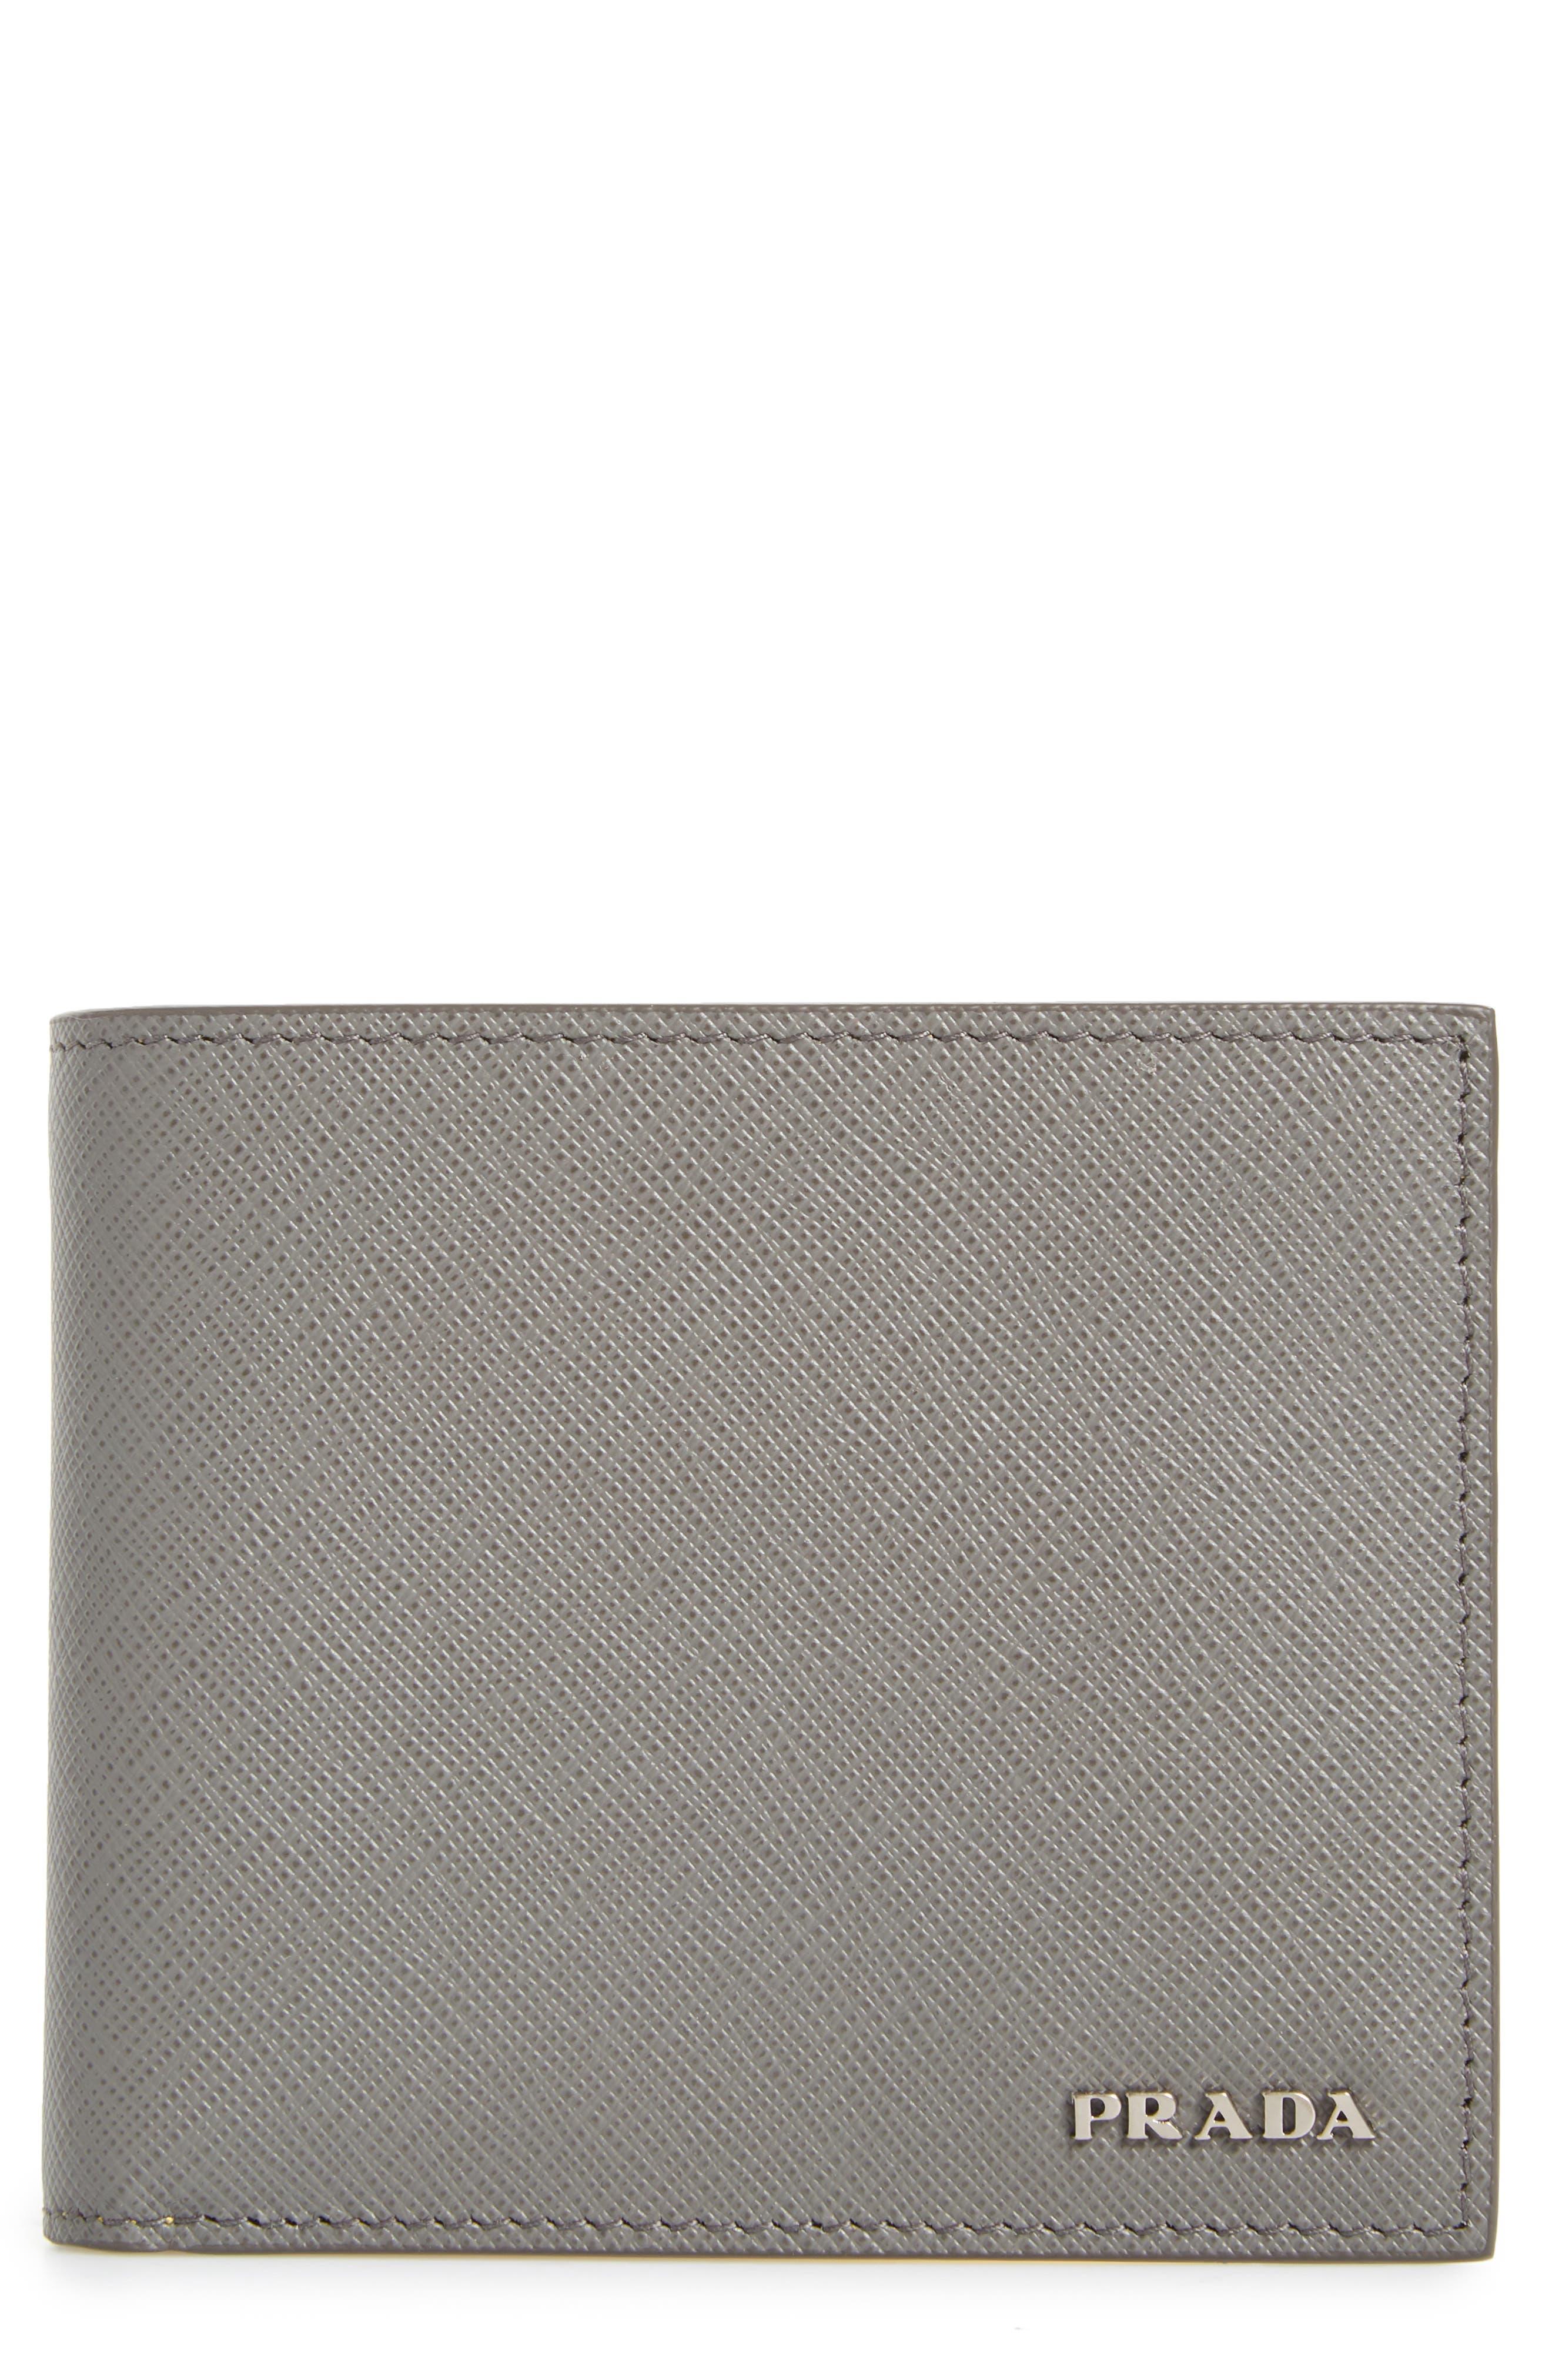 Main Image - Prada Bicolor Leather Wallet